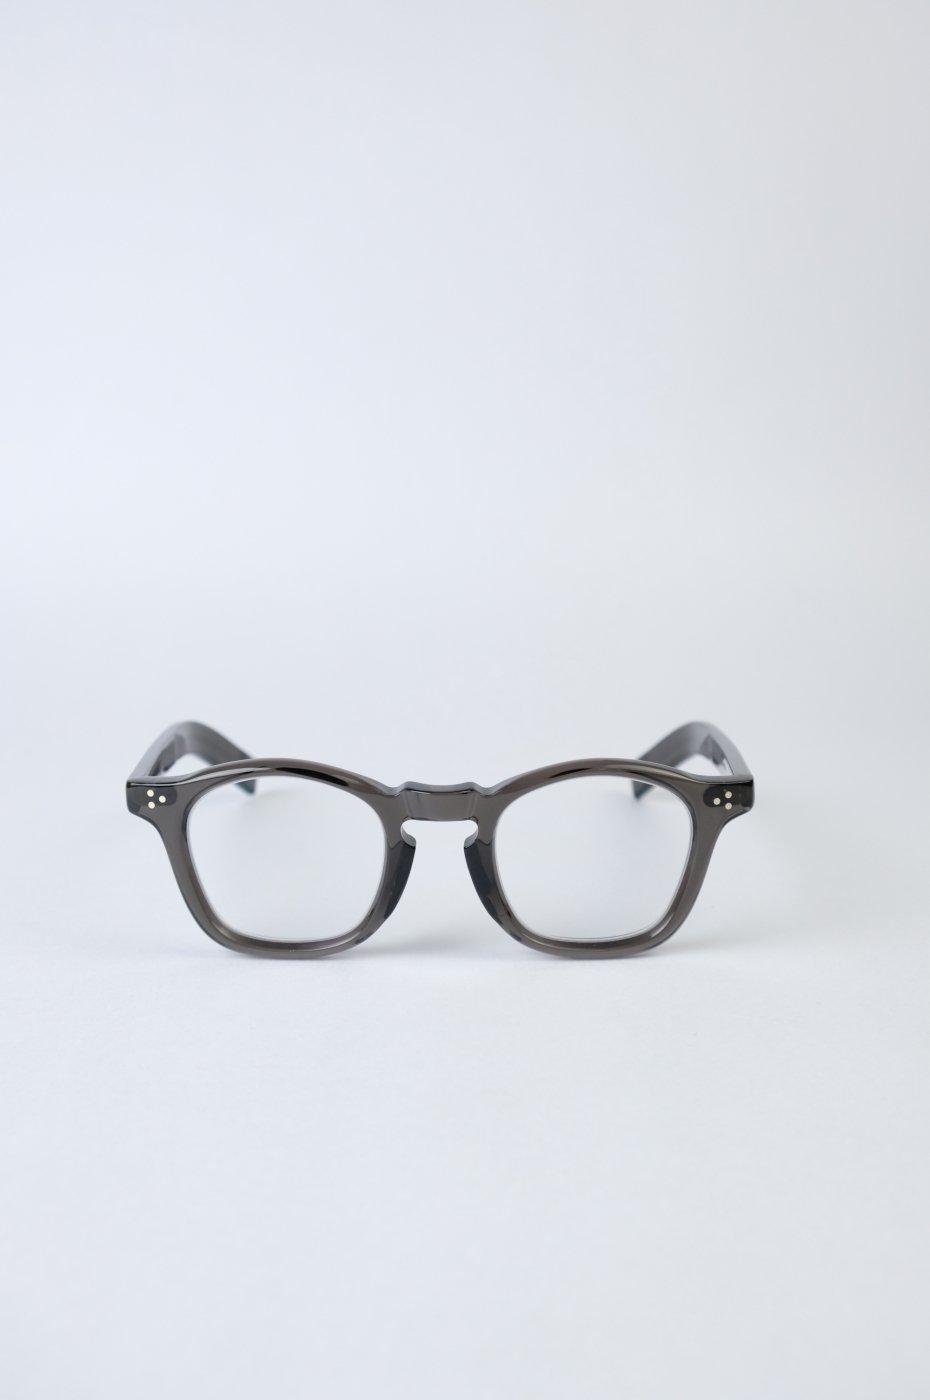 guépard ギュパール-gp-05-Gray-Clear Lens-